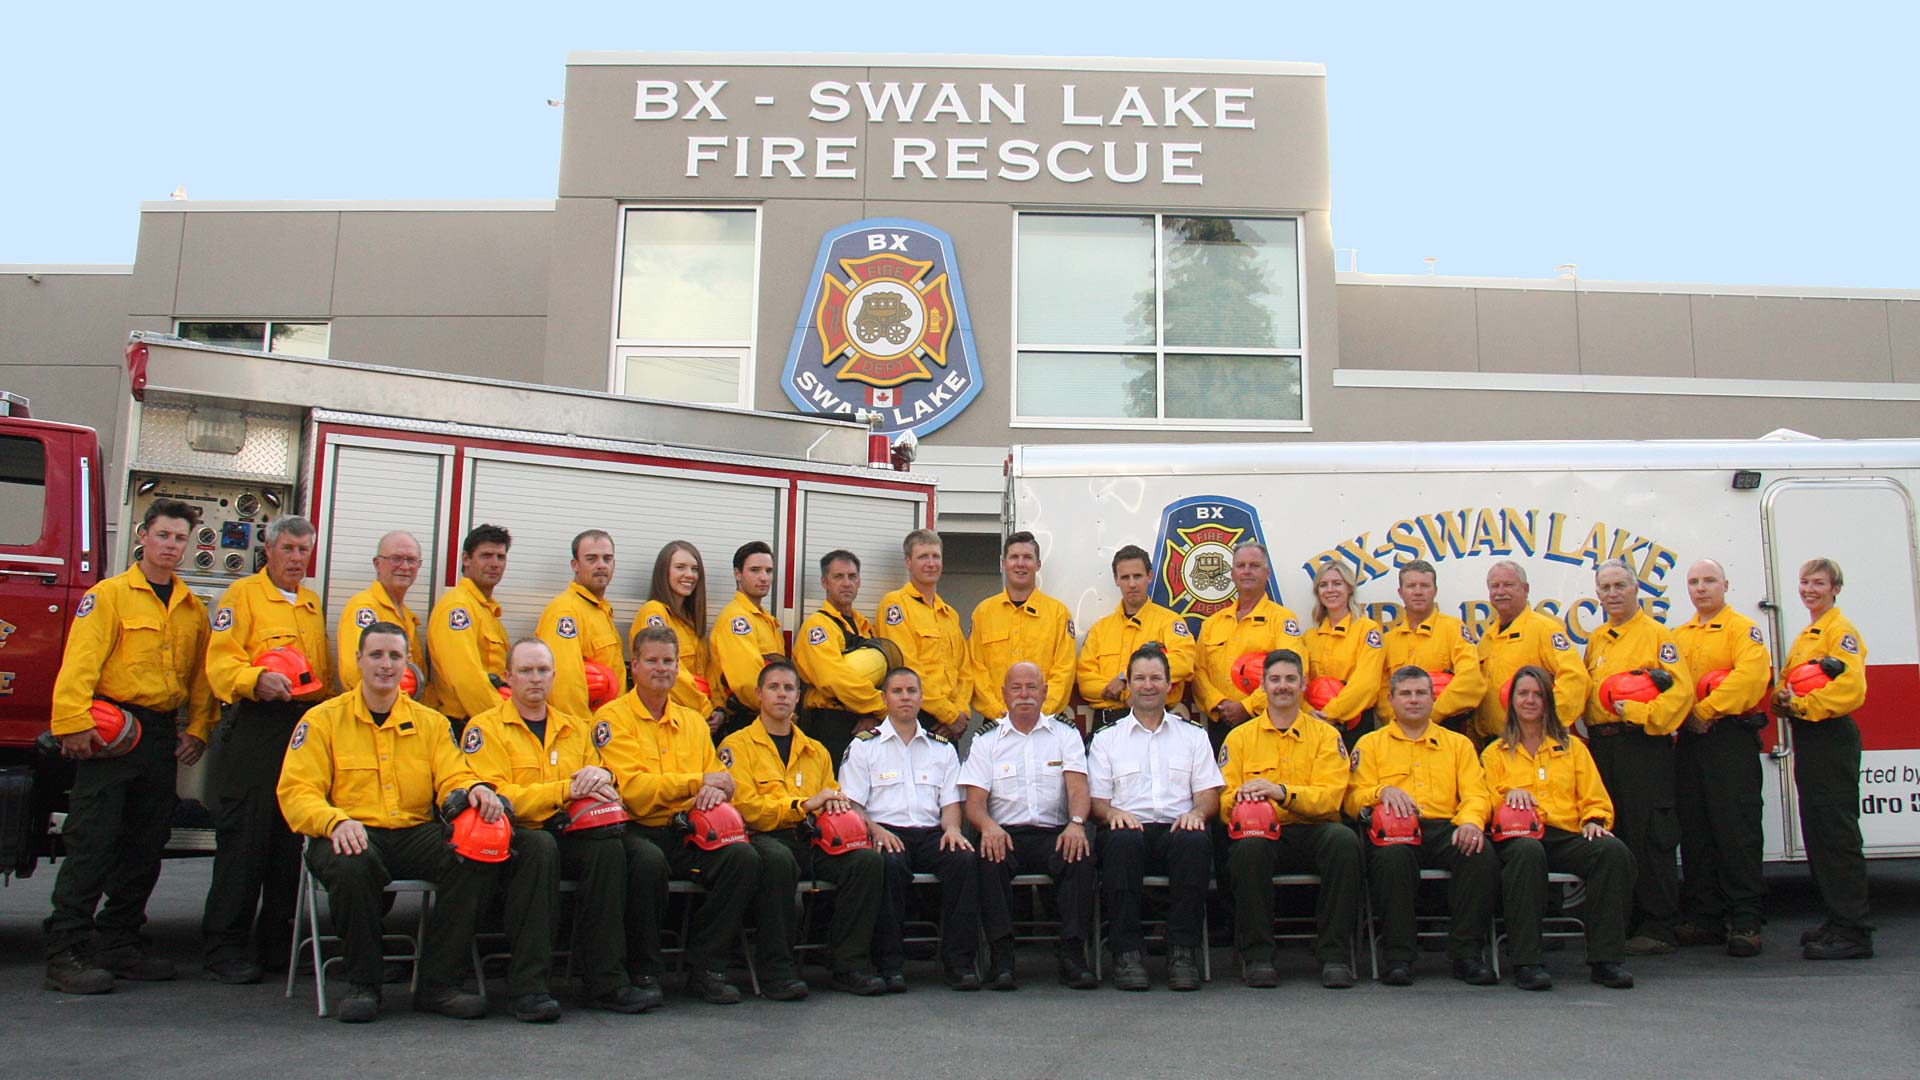 BX Swan Lake Fire Rescue Community Fund Raising